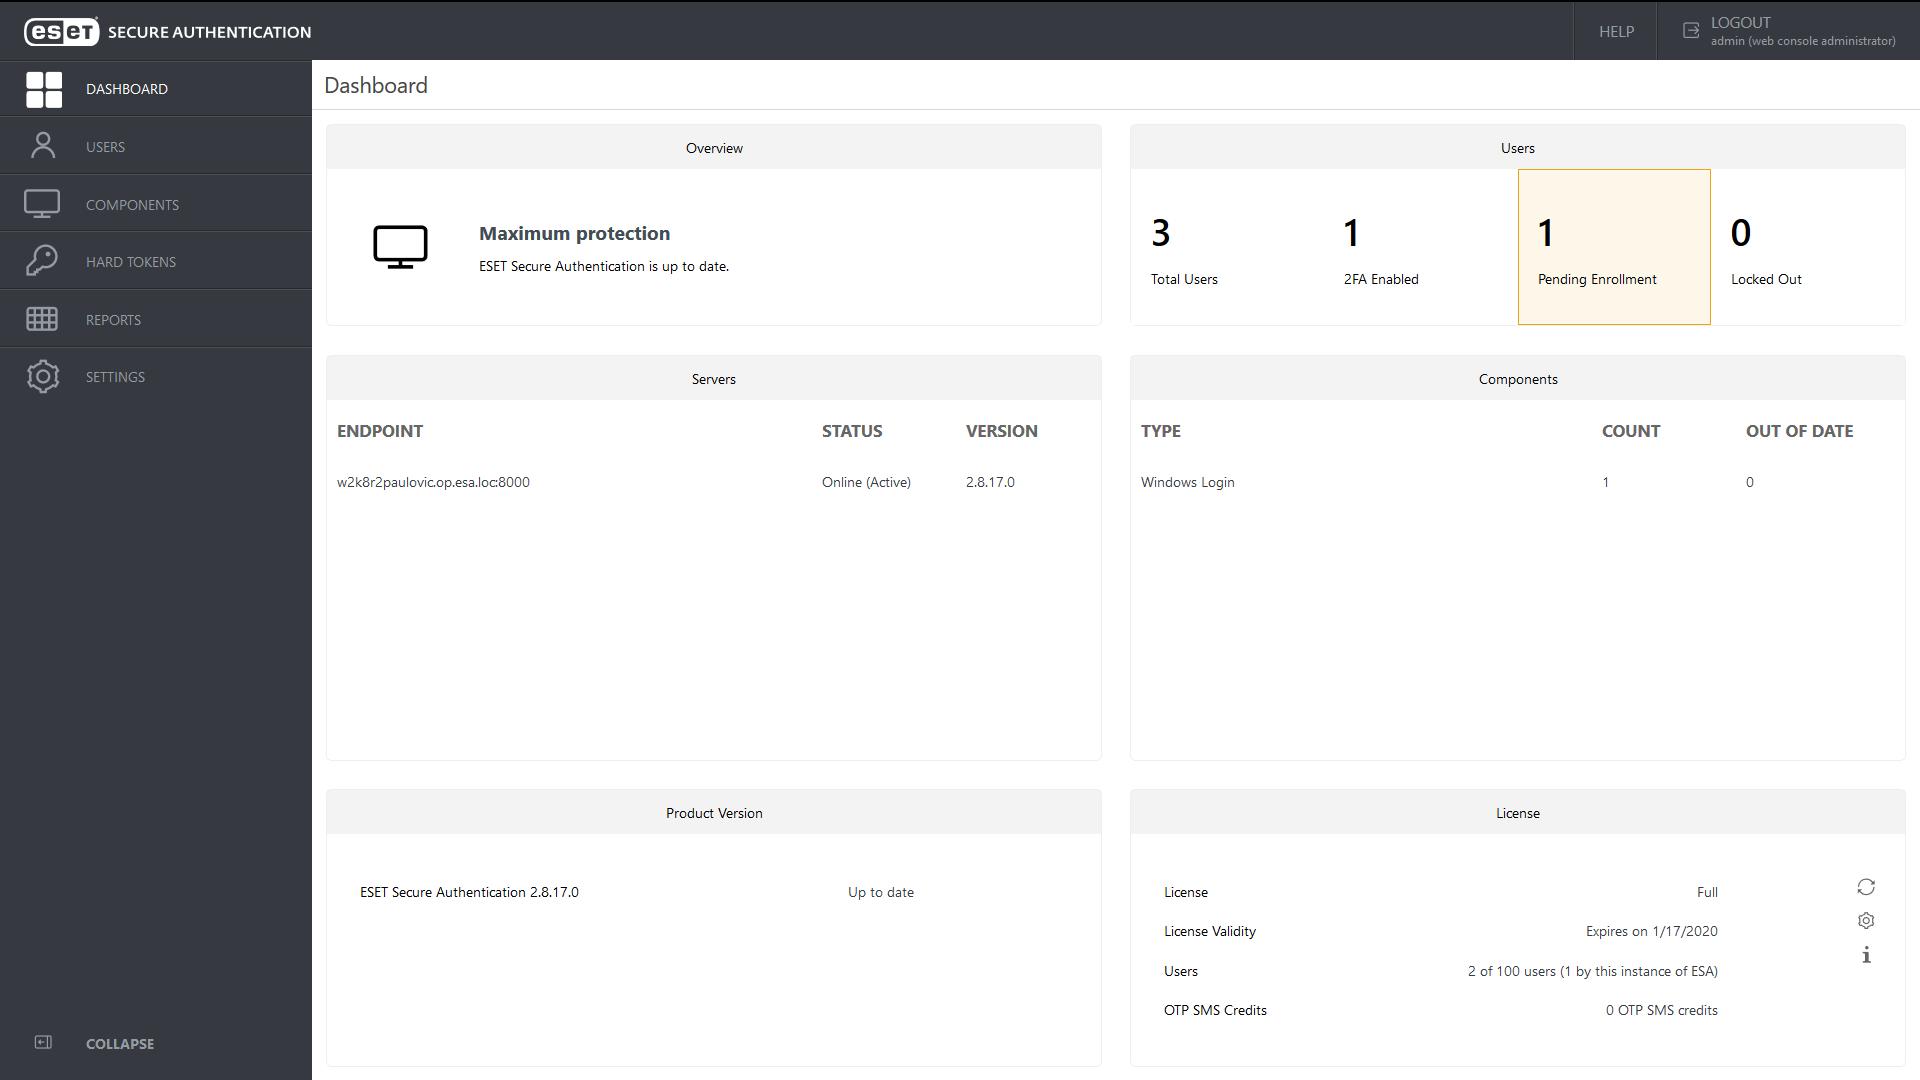 ESET Secure Autentication - Dashboard